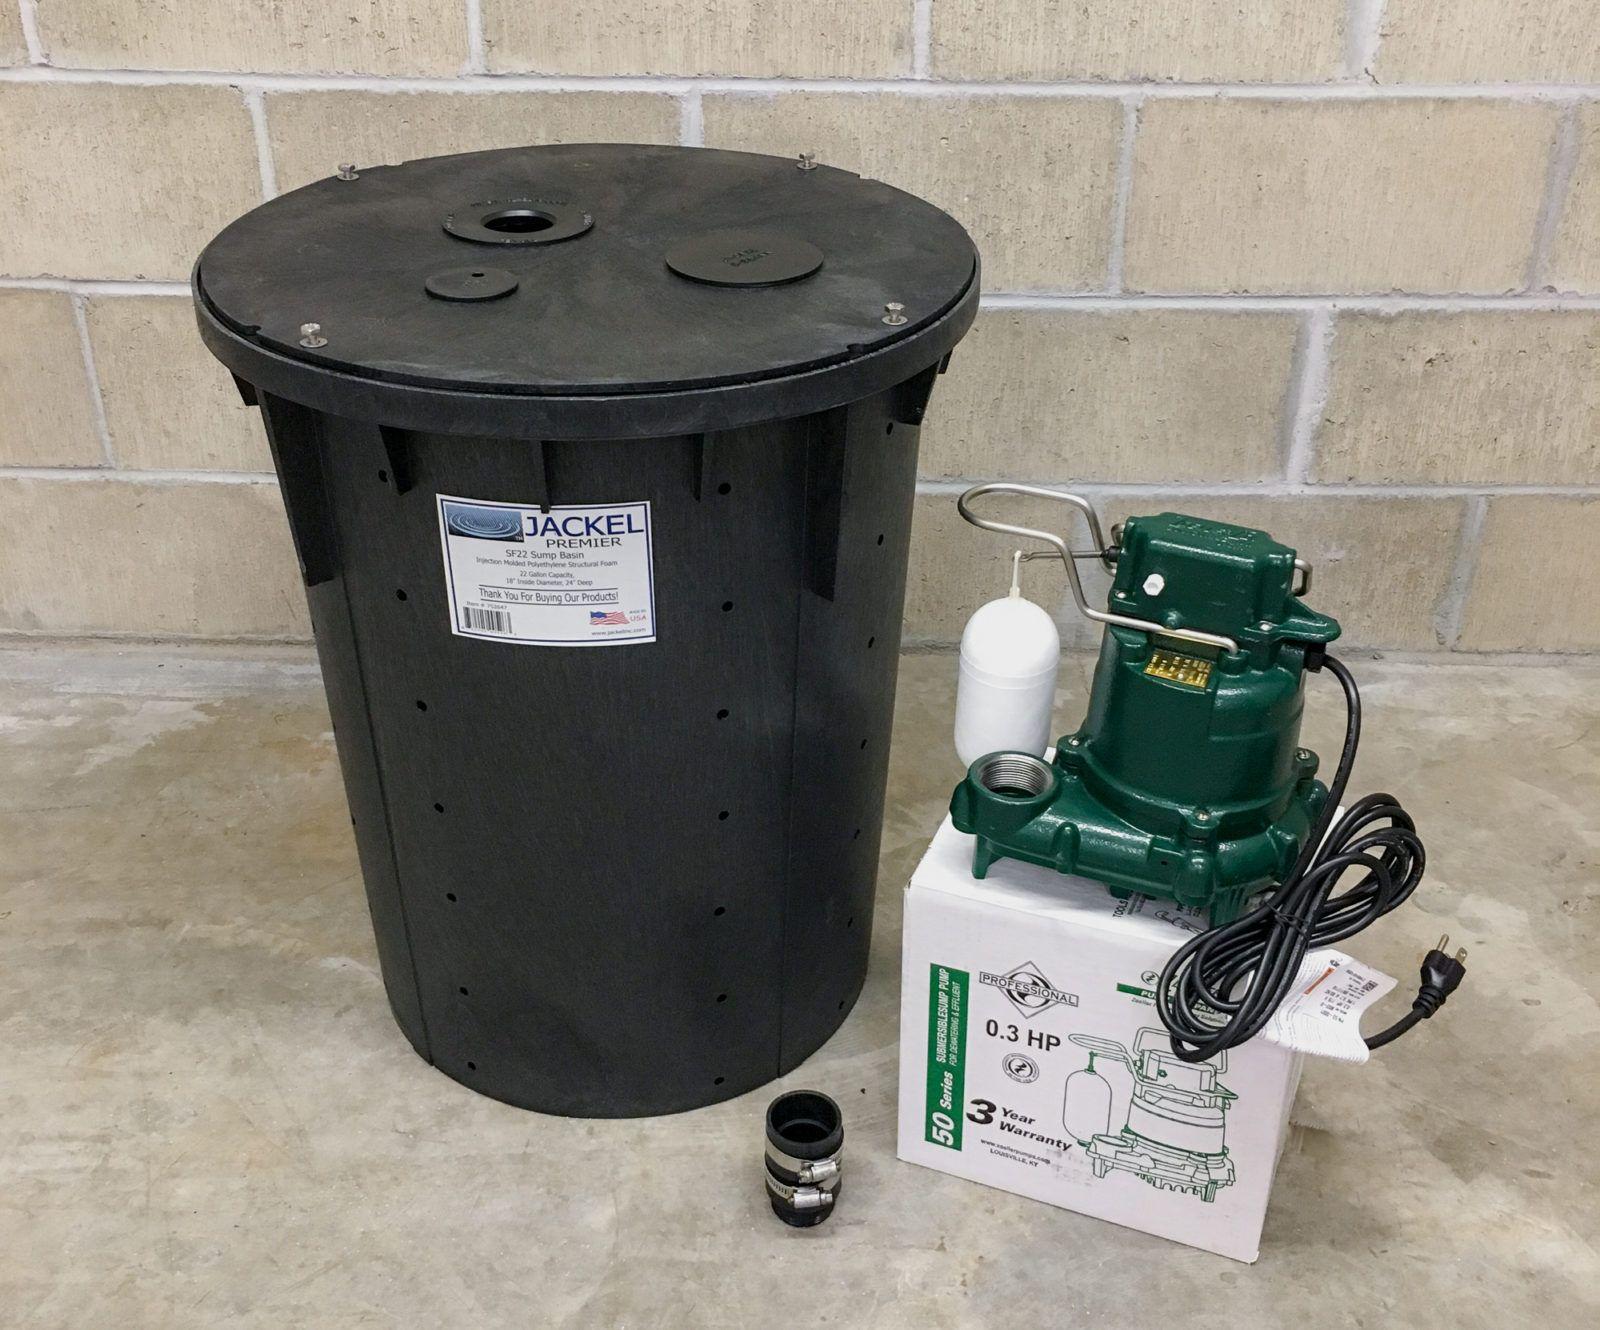 Diy Sump Pump System How To Install A Sump Pump Waterproof Com Waterproofing Basement Basement Waterproofing Diy Sump Pump